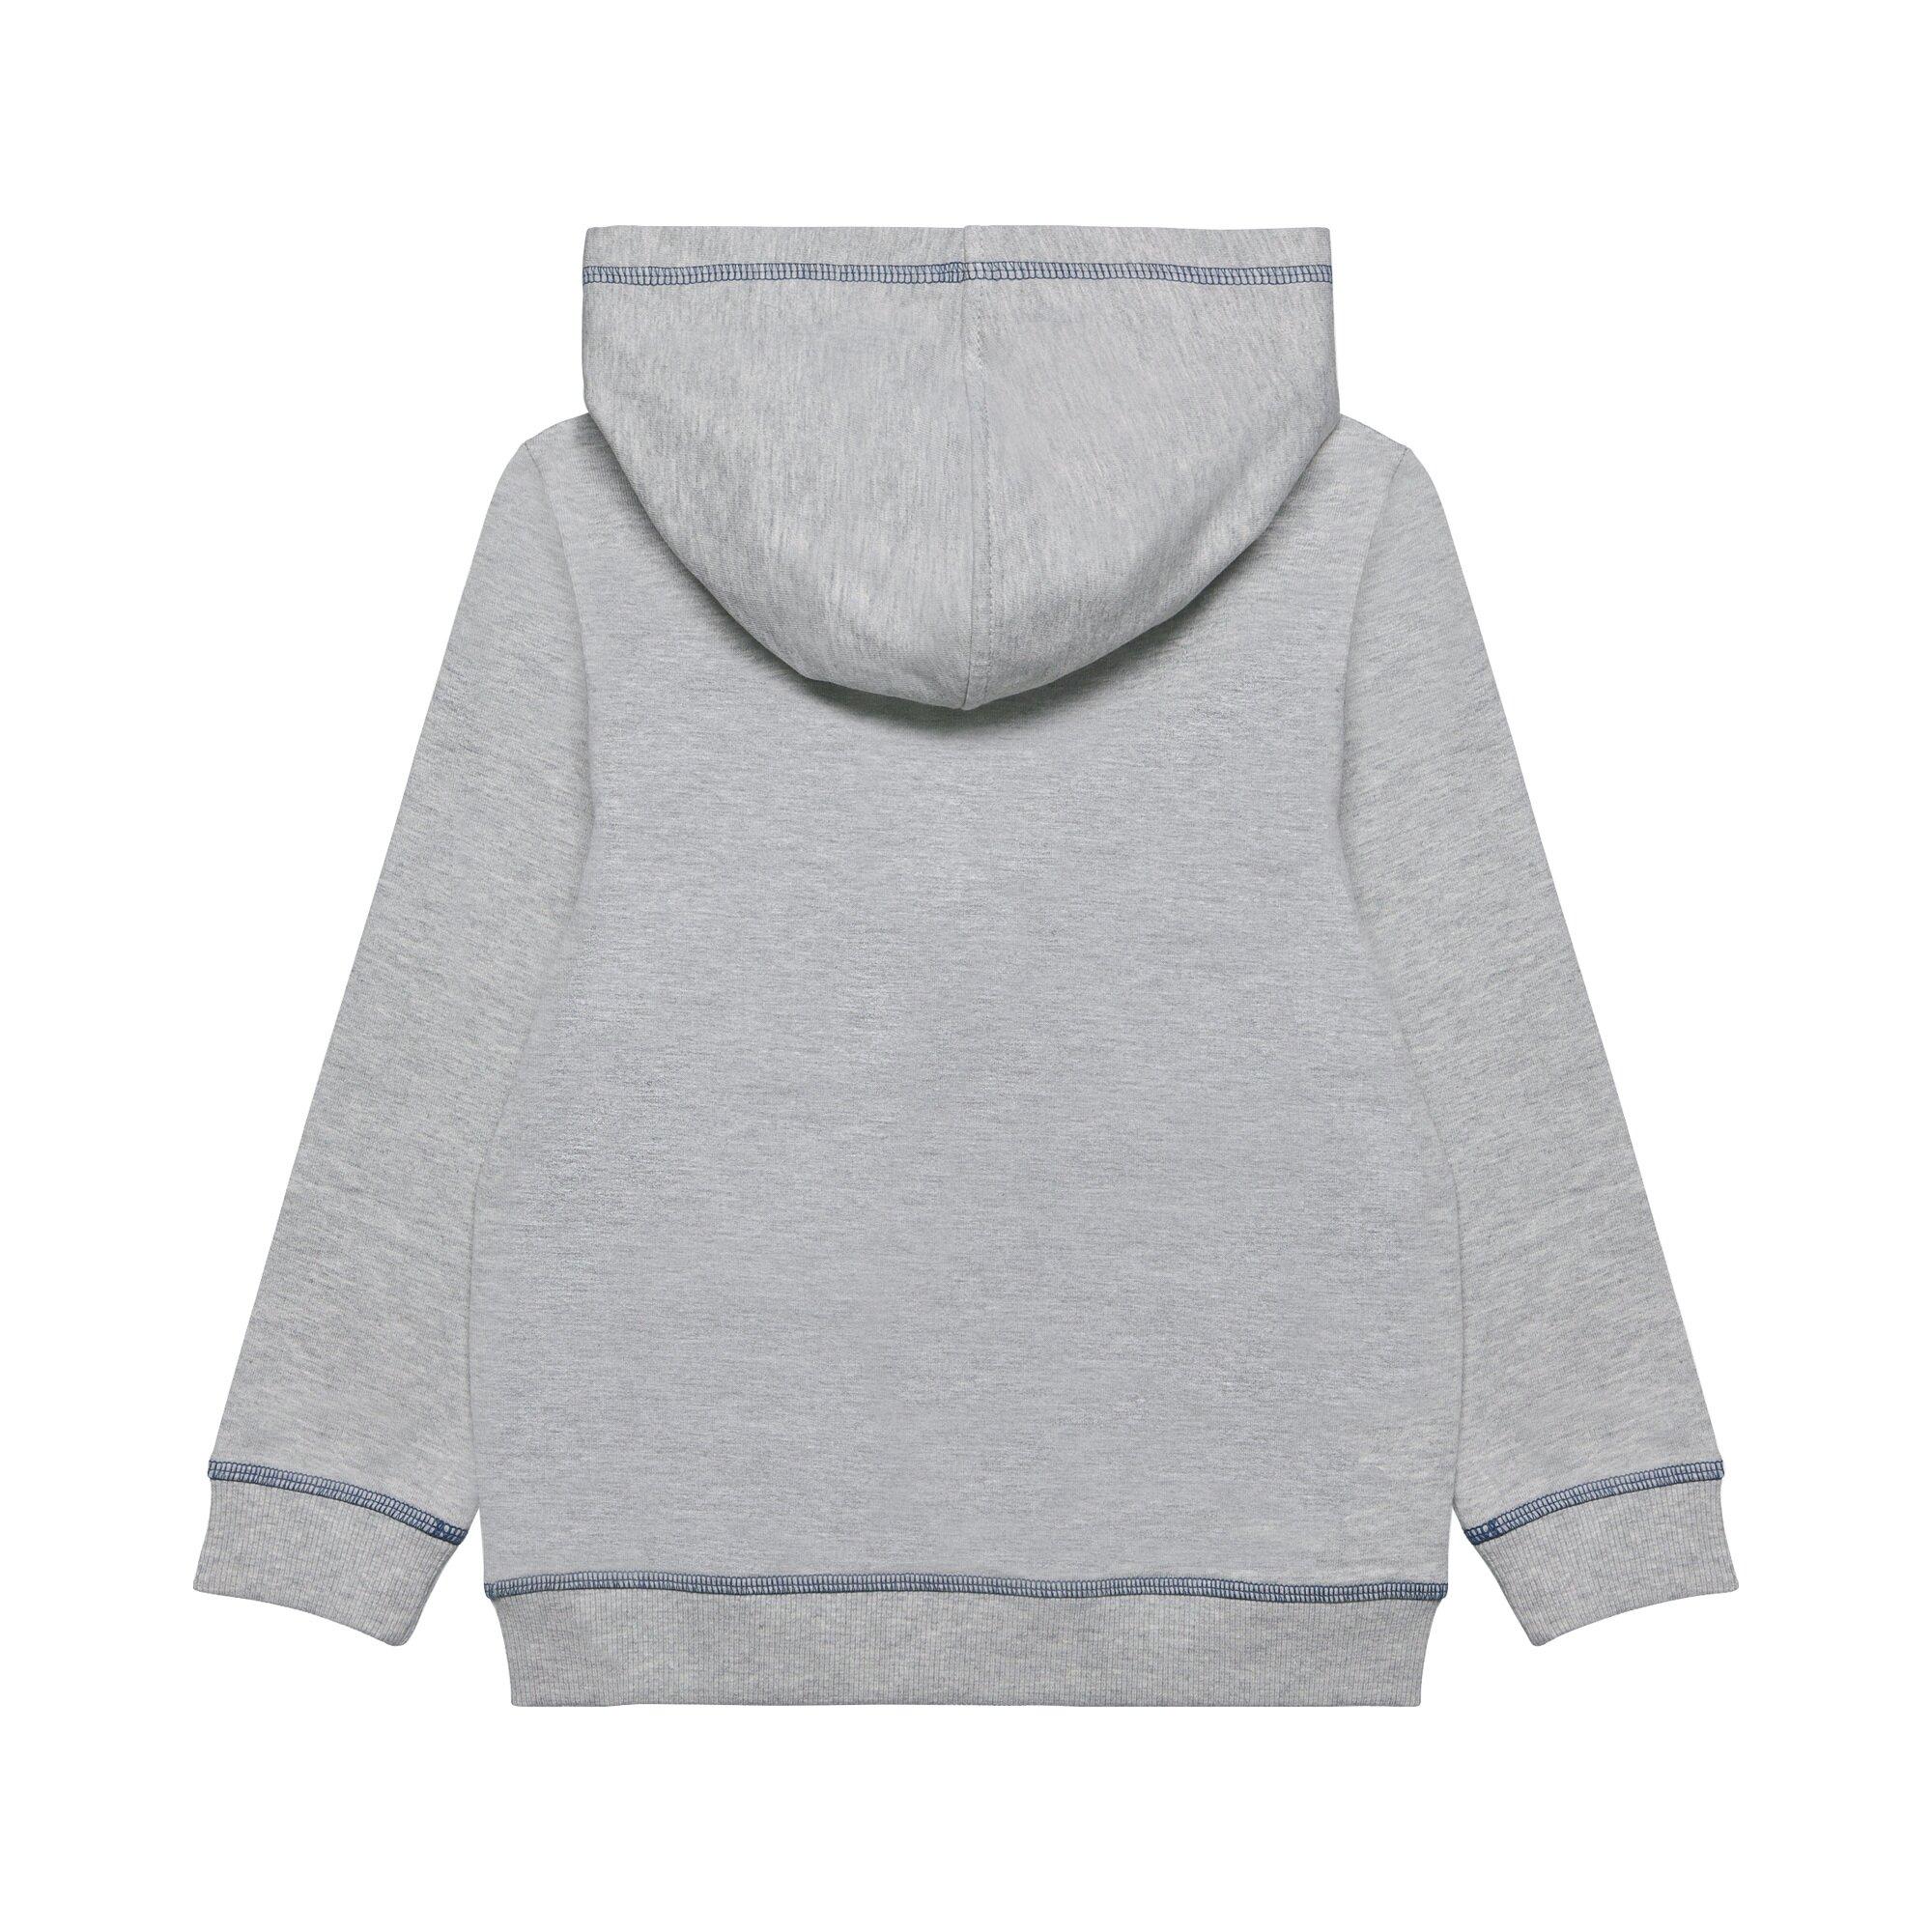 esprit-sweatshirt-kapuze-oktopus